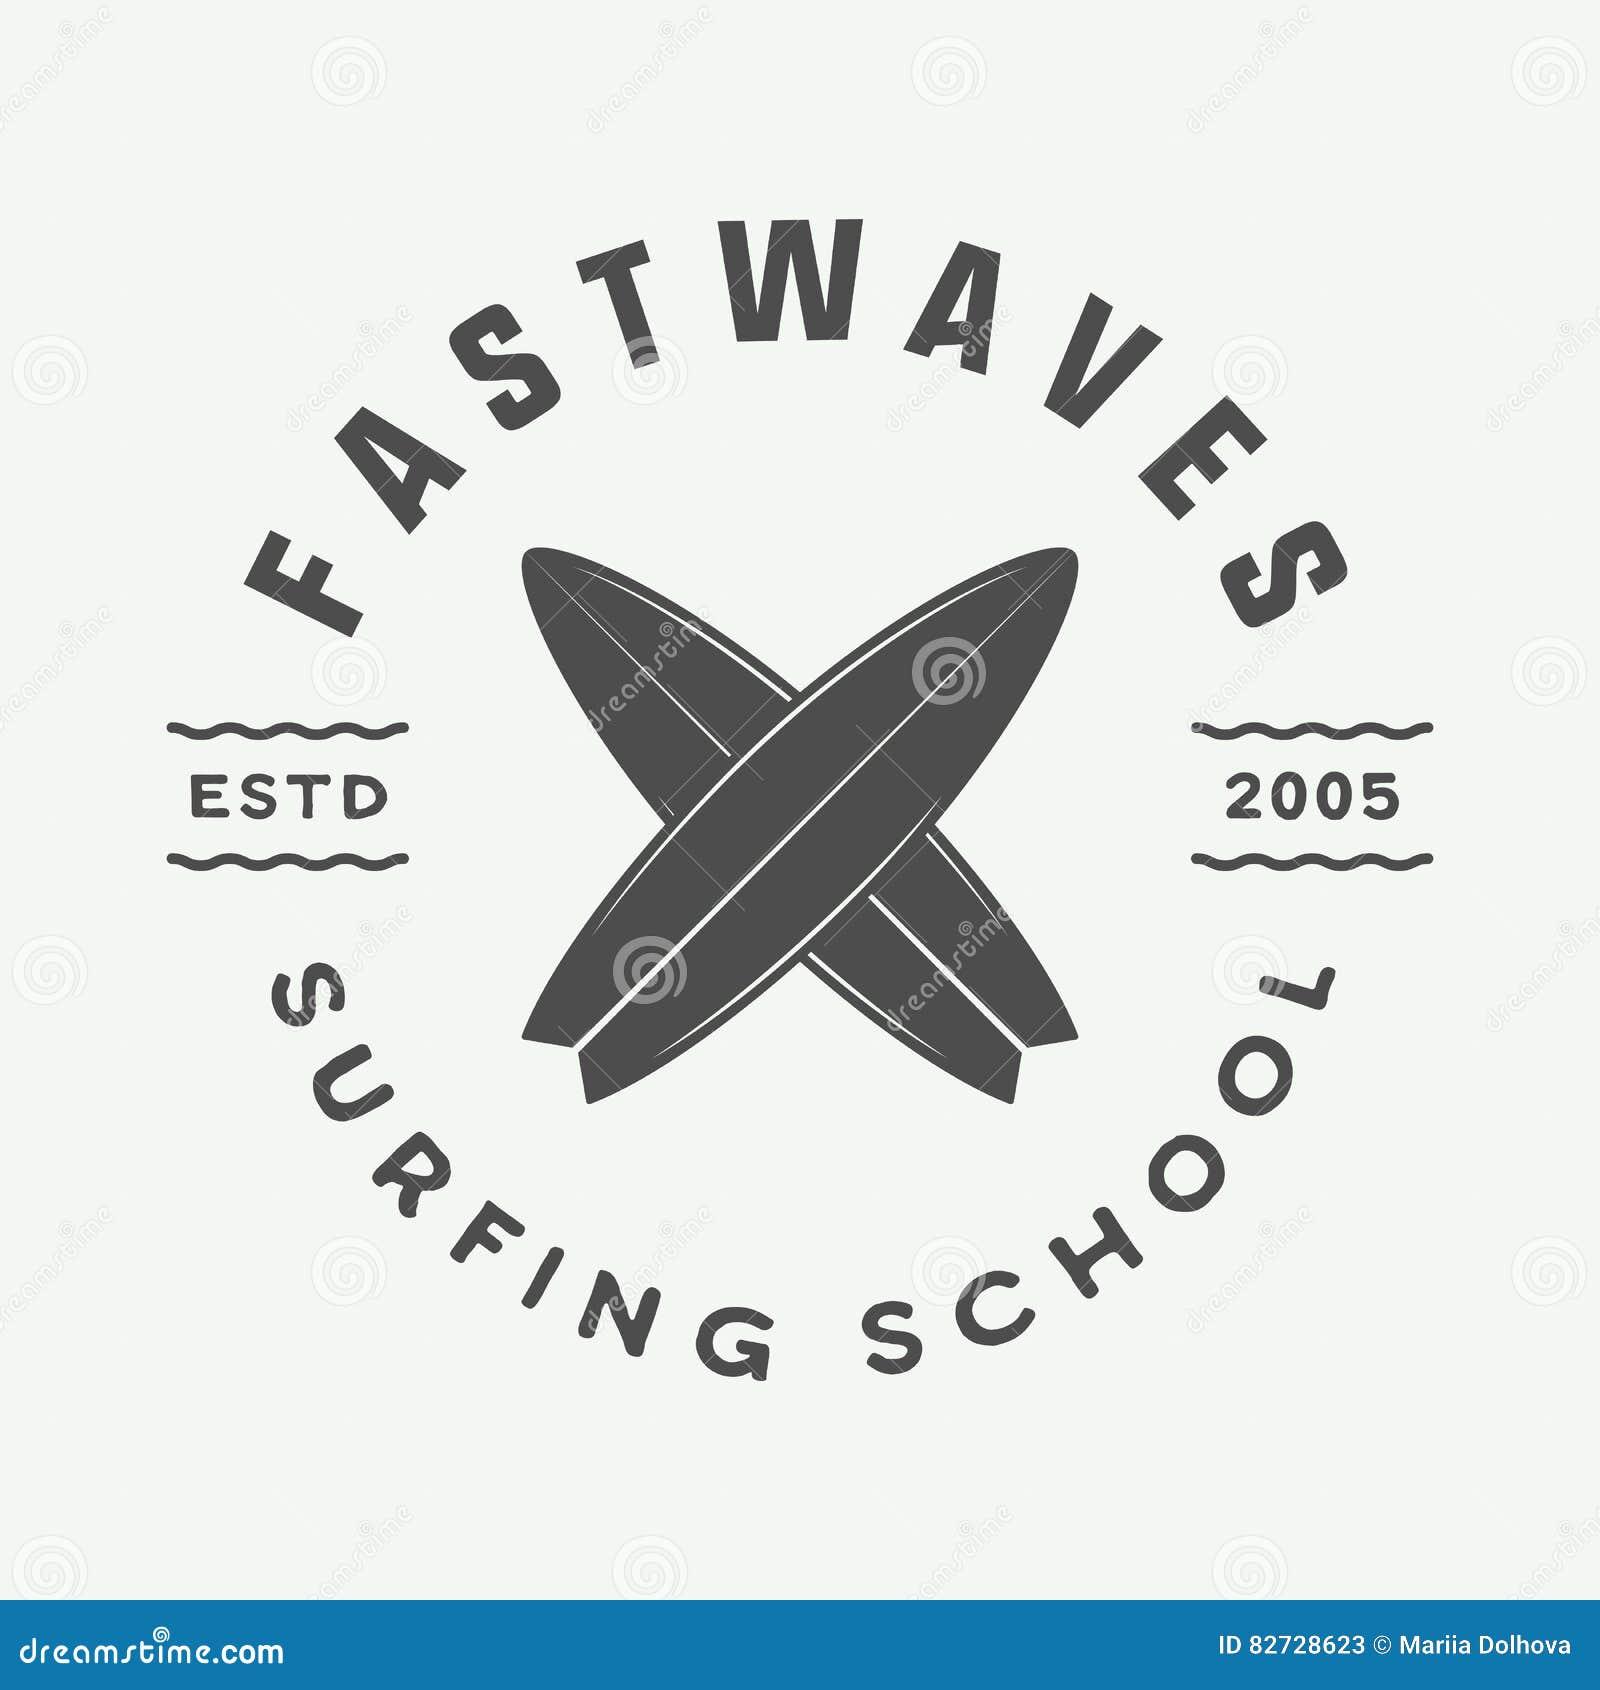 Logotipo surfando do vintage, emblema, crachá, etiqueta, marca